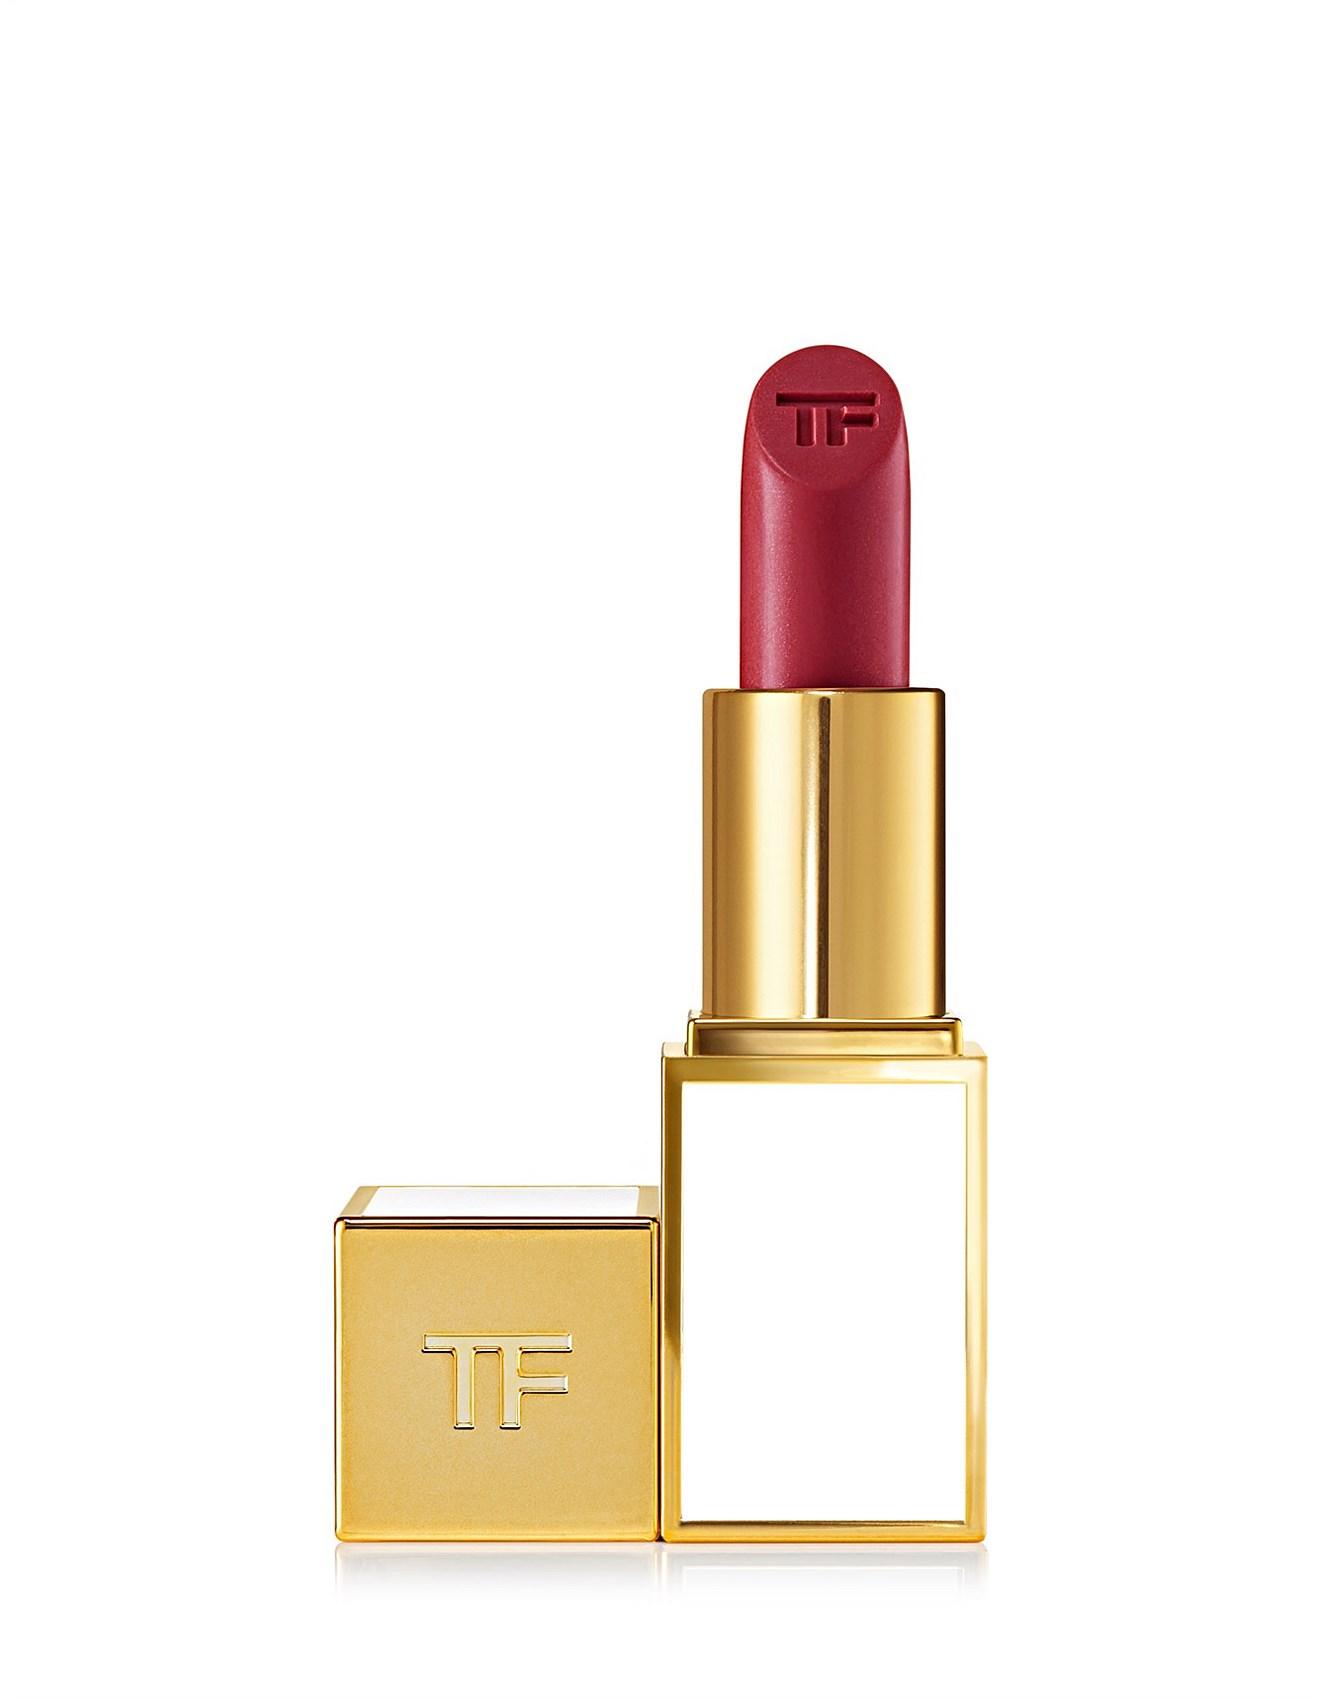 Makeup Perfume Beauty Skincare Shop Online David